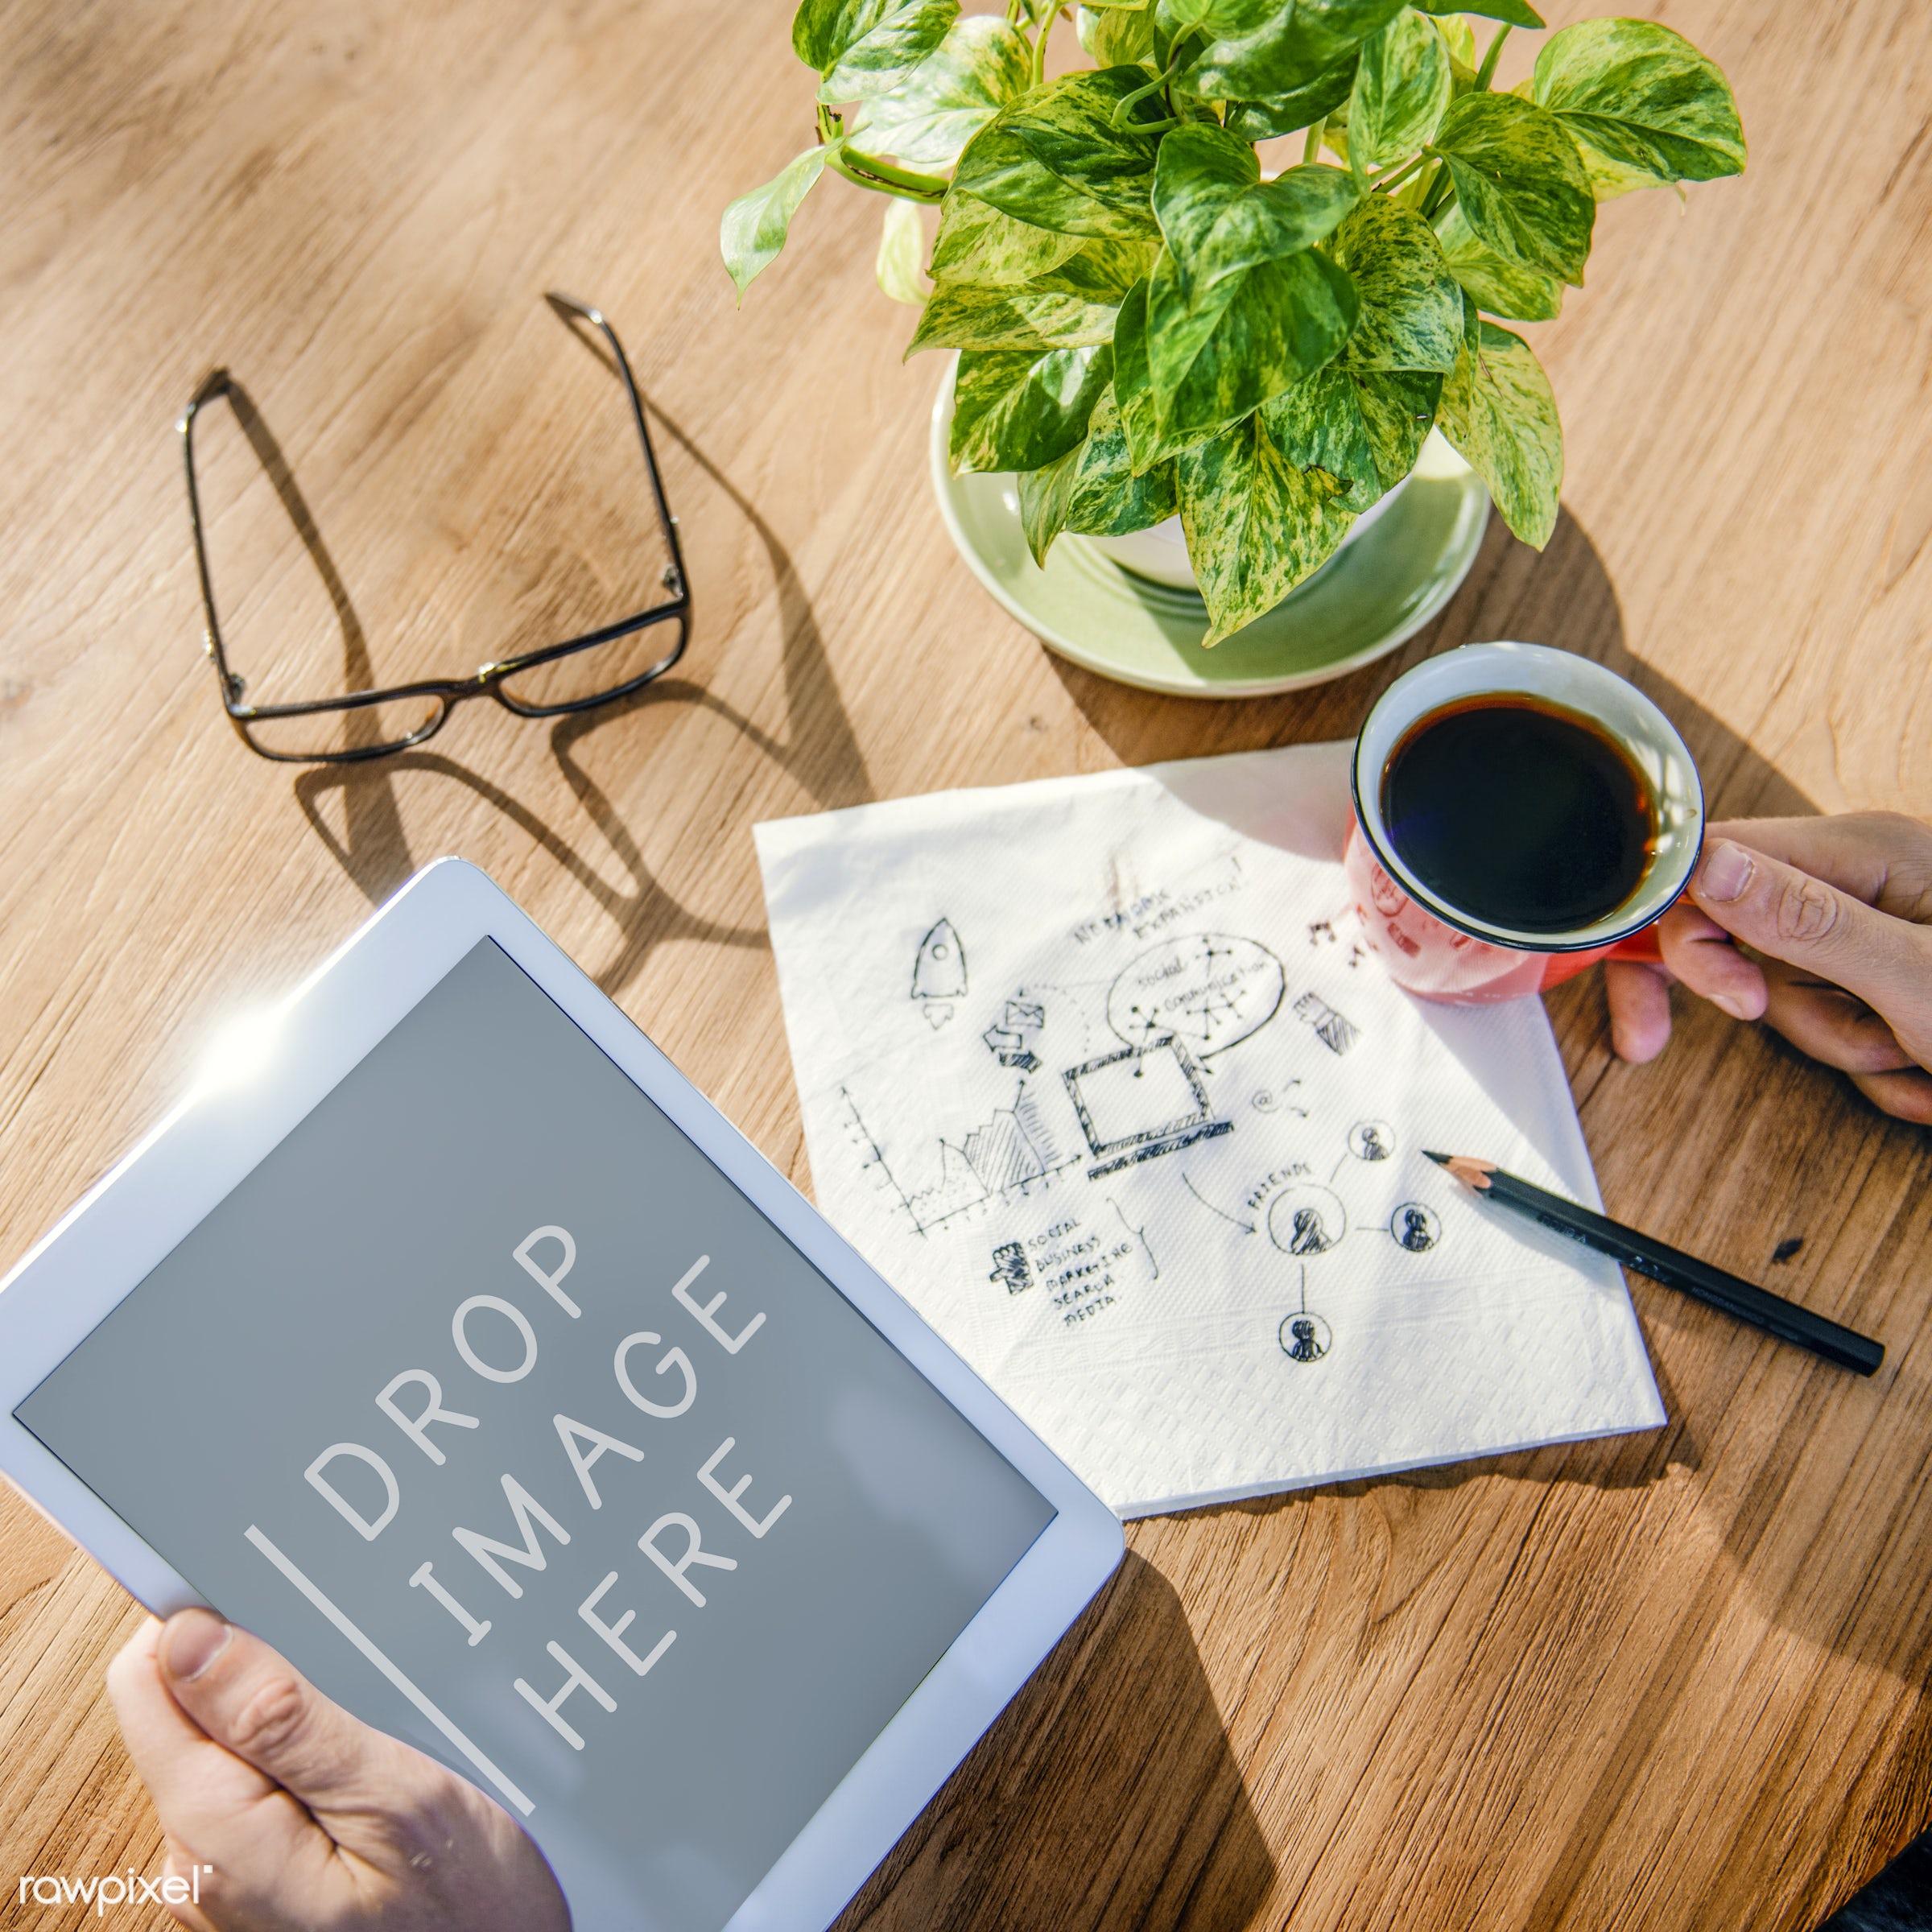 break, business, coffee, coffee break, connection, copy space, copyspace, development, digital tablet, drinks, drop image...